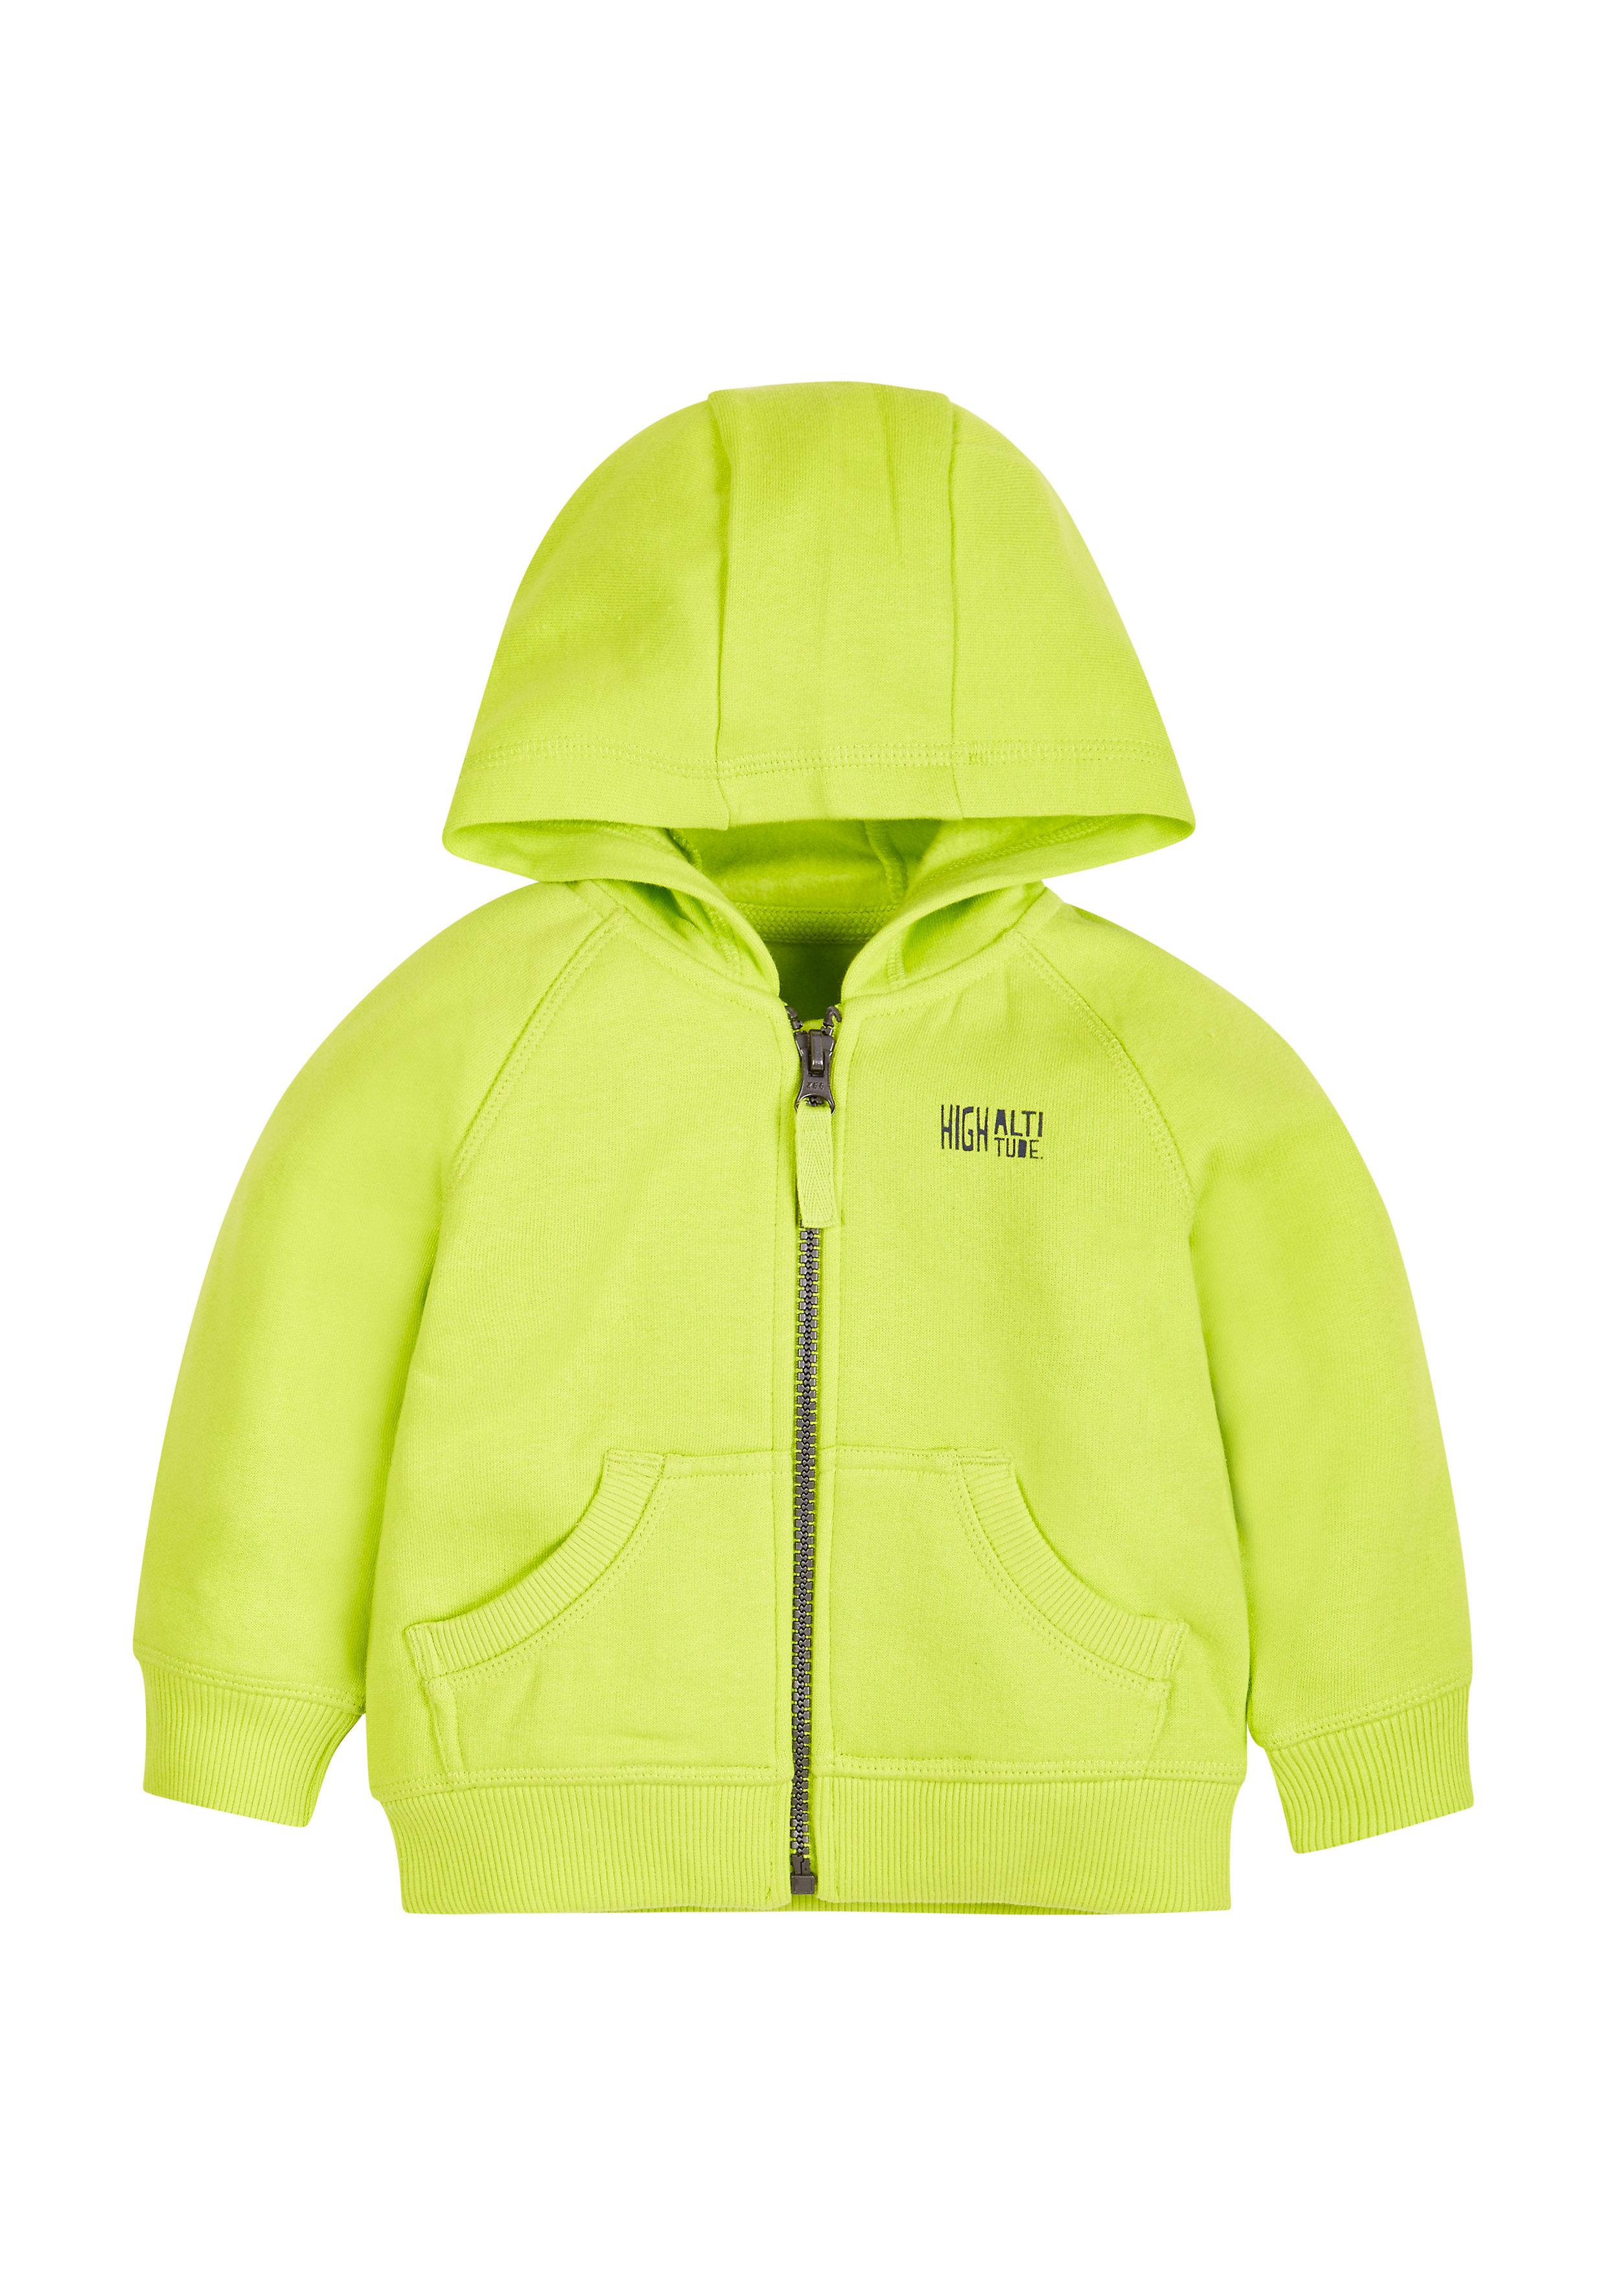 Mothercare | Boys Full Sleeves Hooded Sweatshirt Zip Opening - Lime